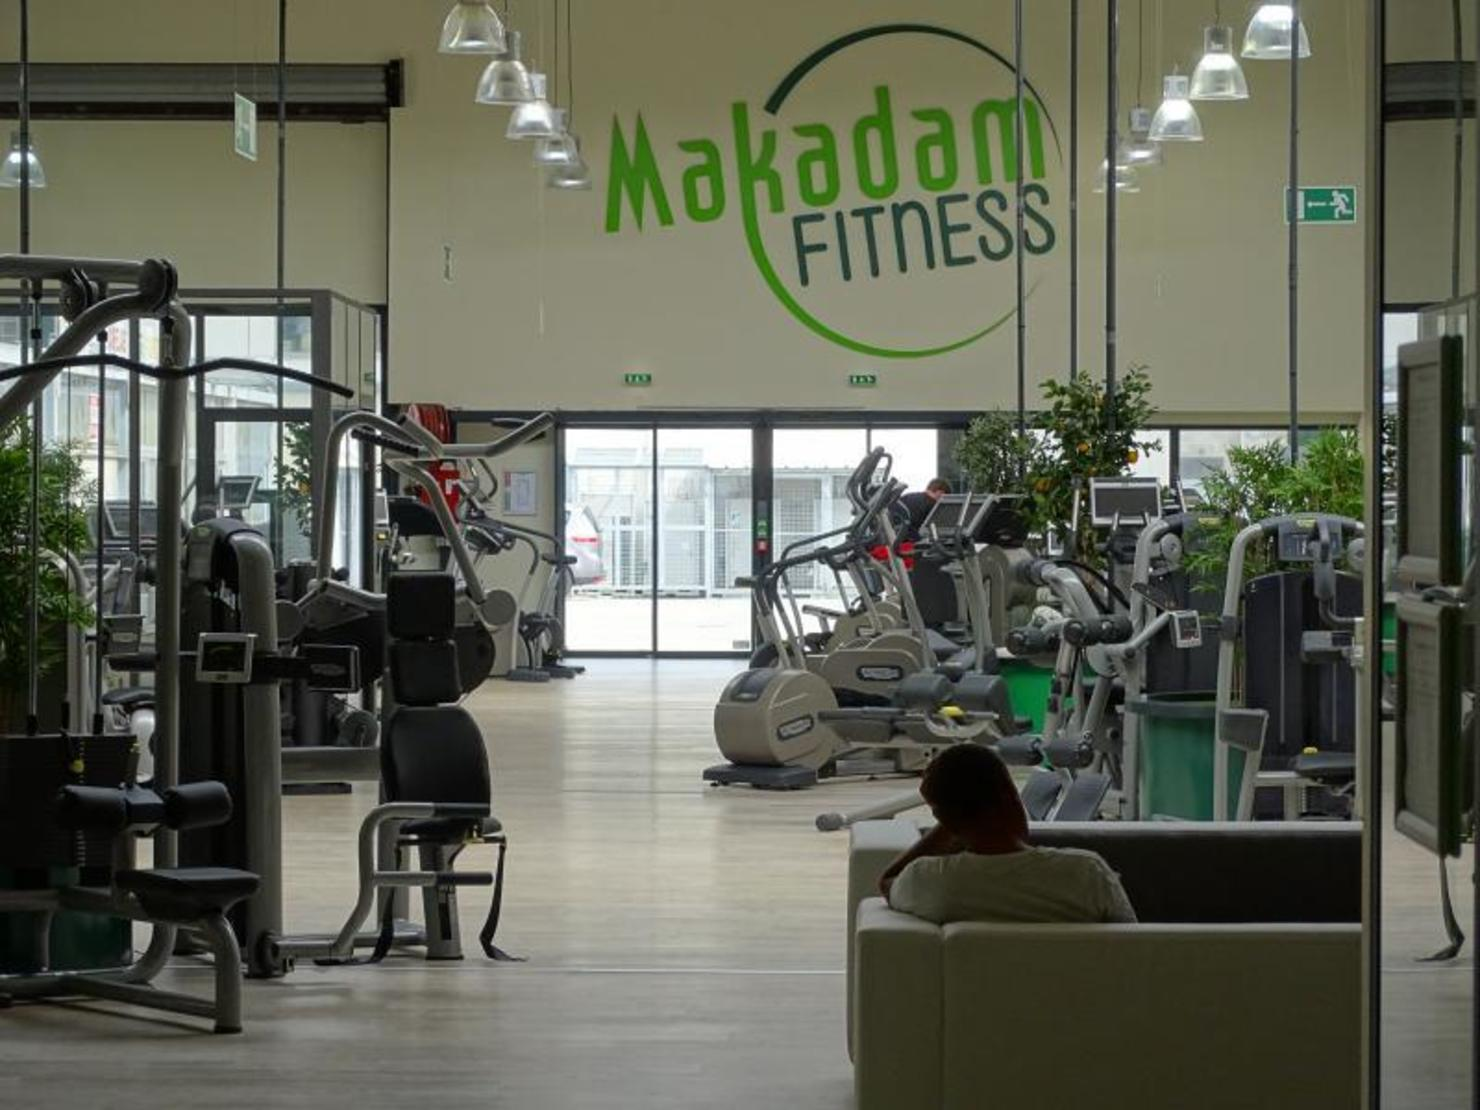 makadam fitness bordeaux tarifs avis horaires essai gratuit